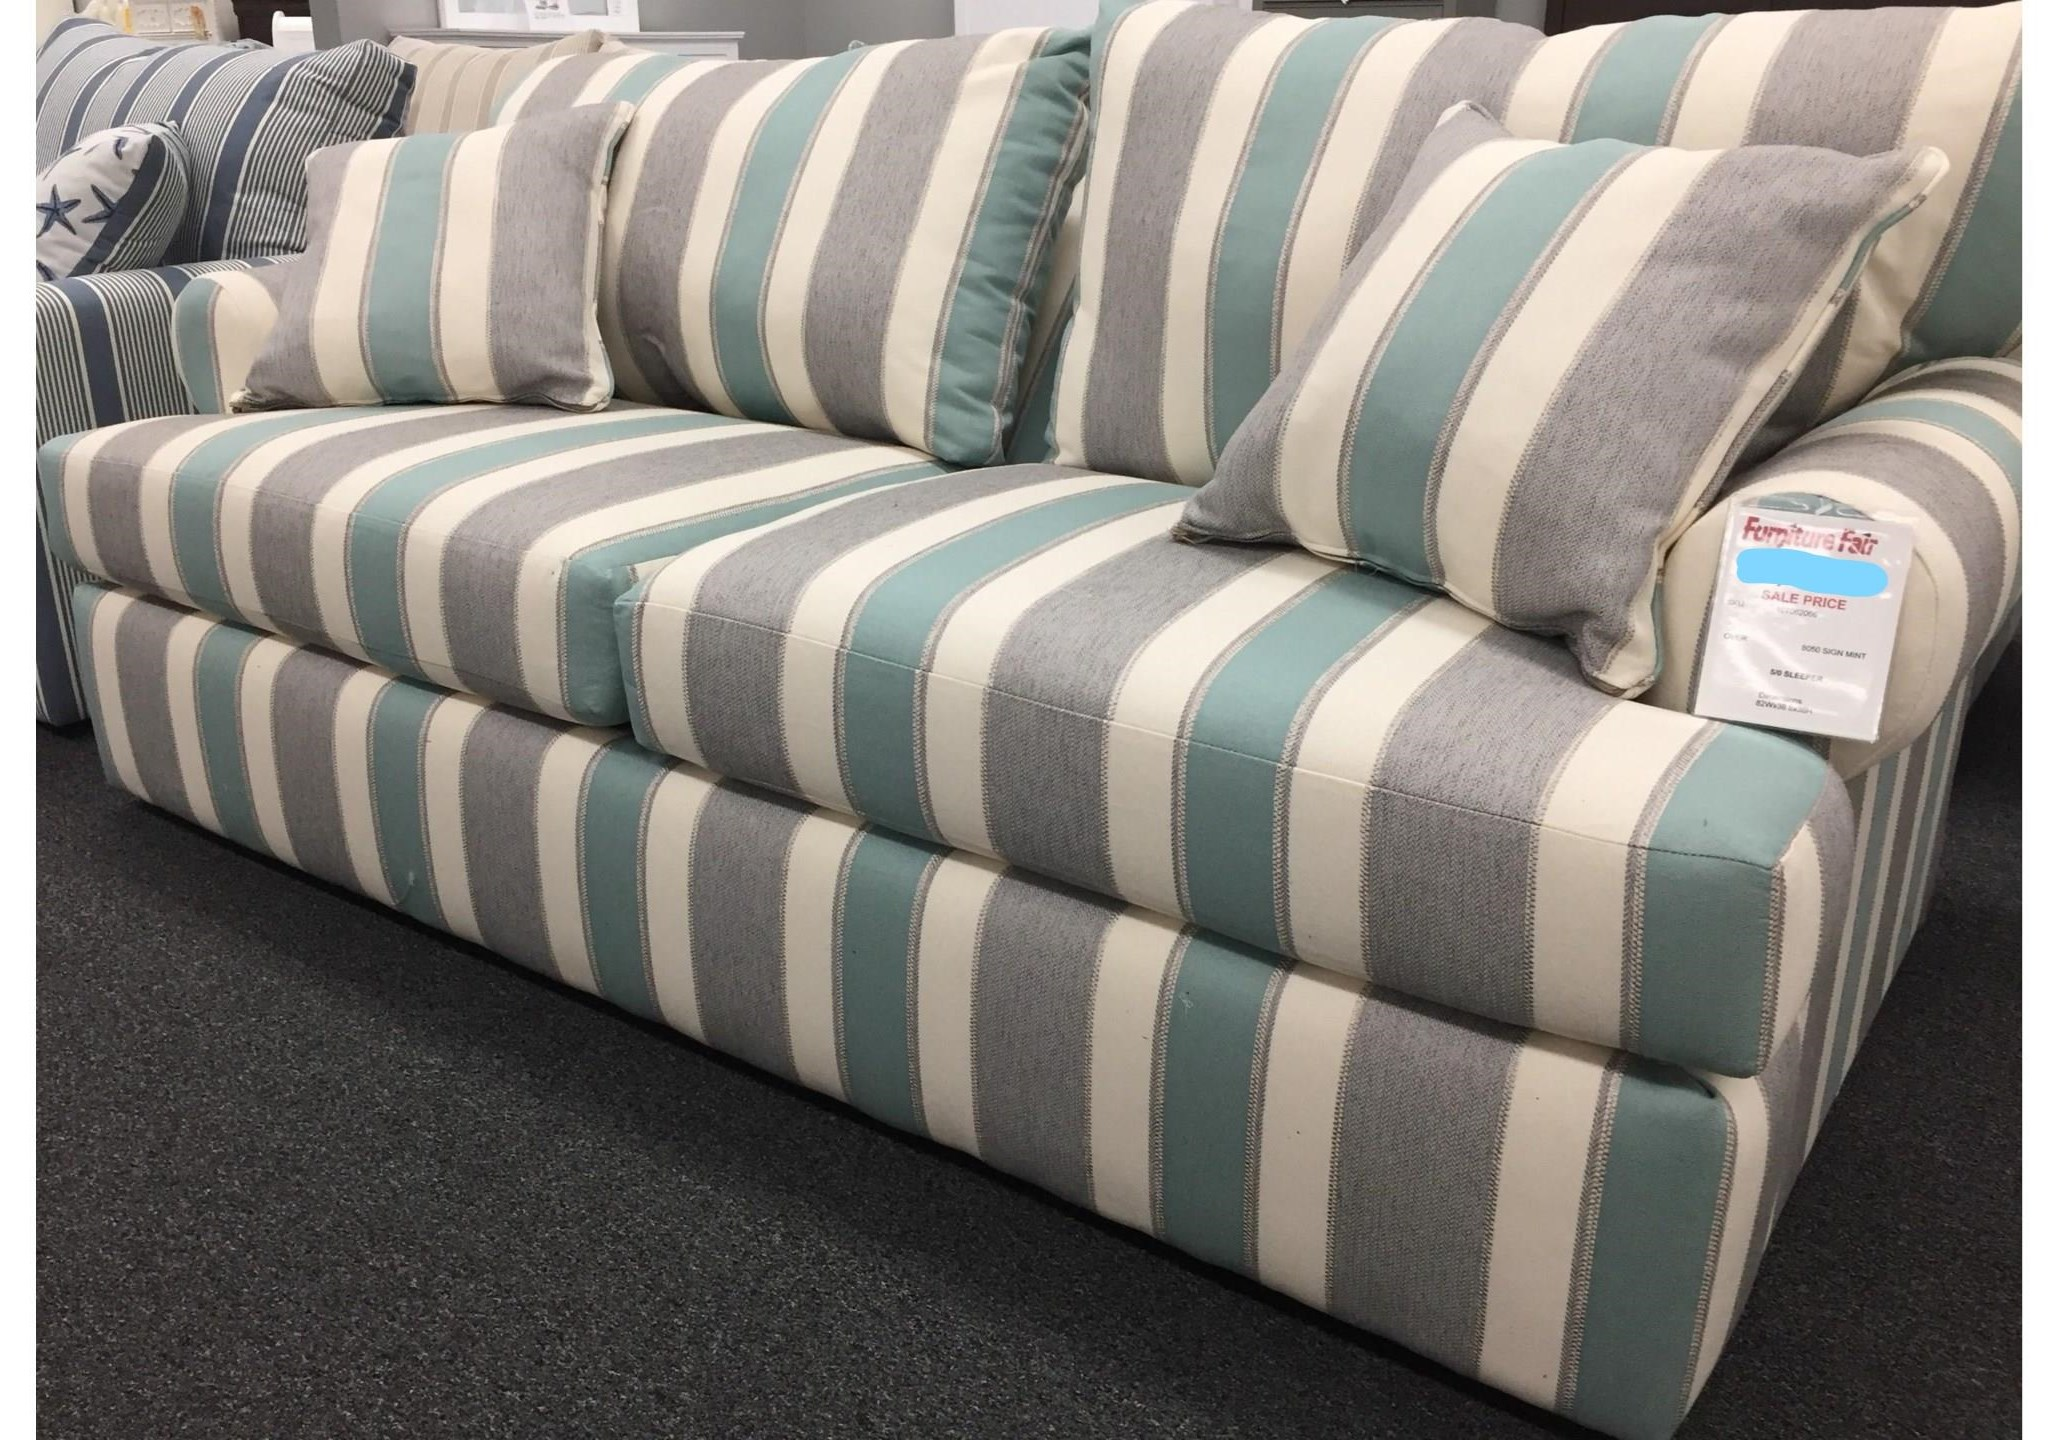 Coastal Sleeper Collection 8050 Signature Mist Queen Sleeper by Overnight Sofa at Furniture Fair - North Carolina